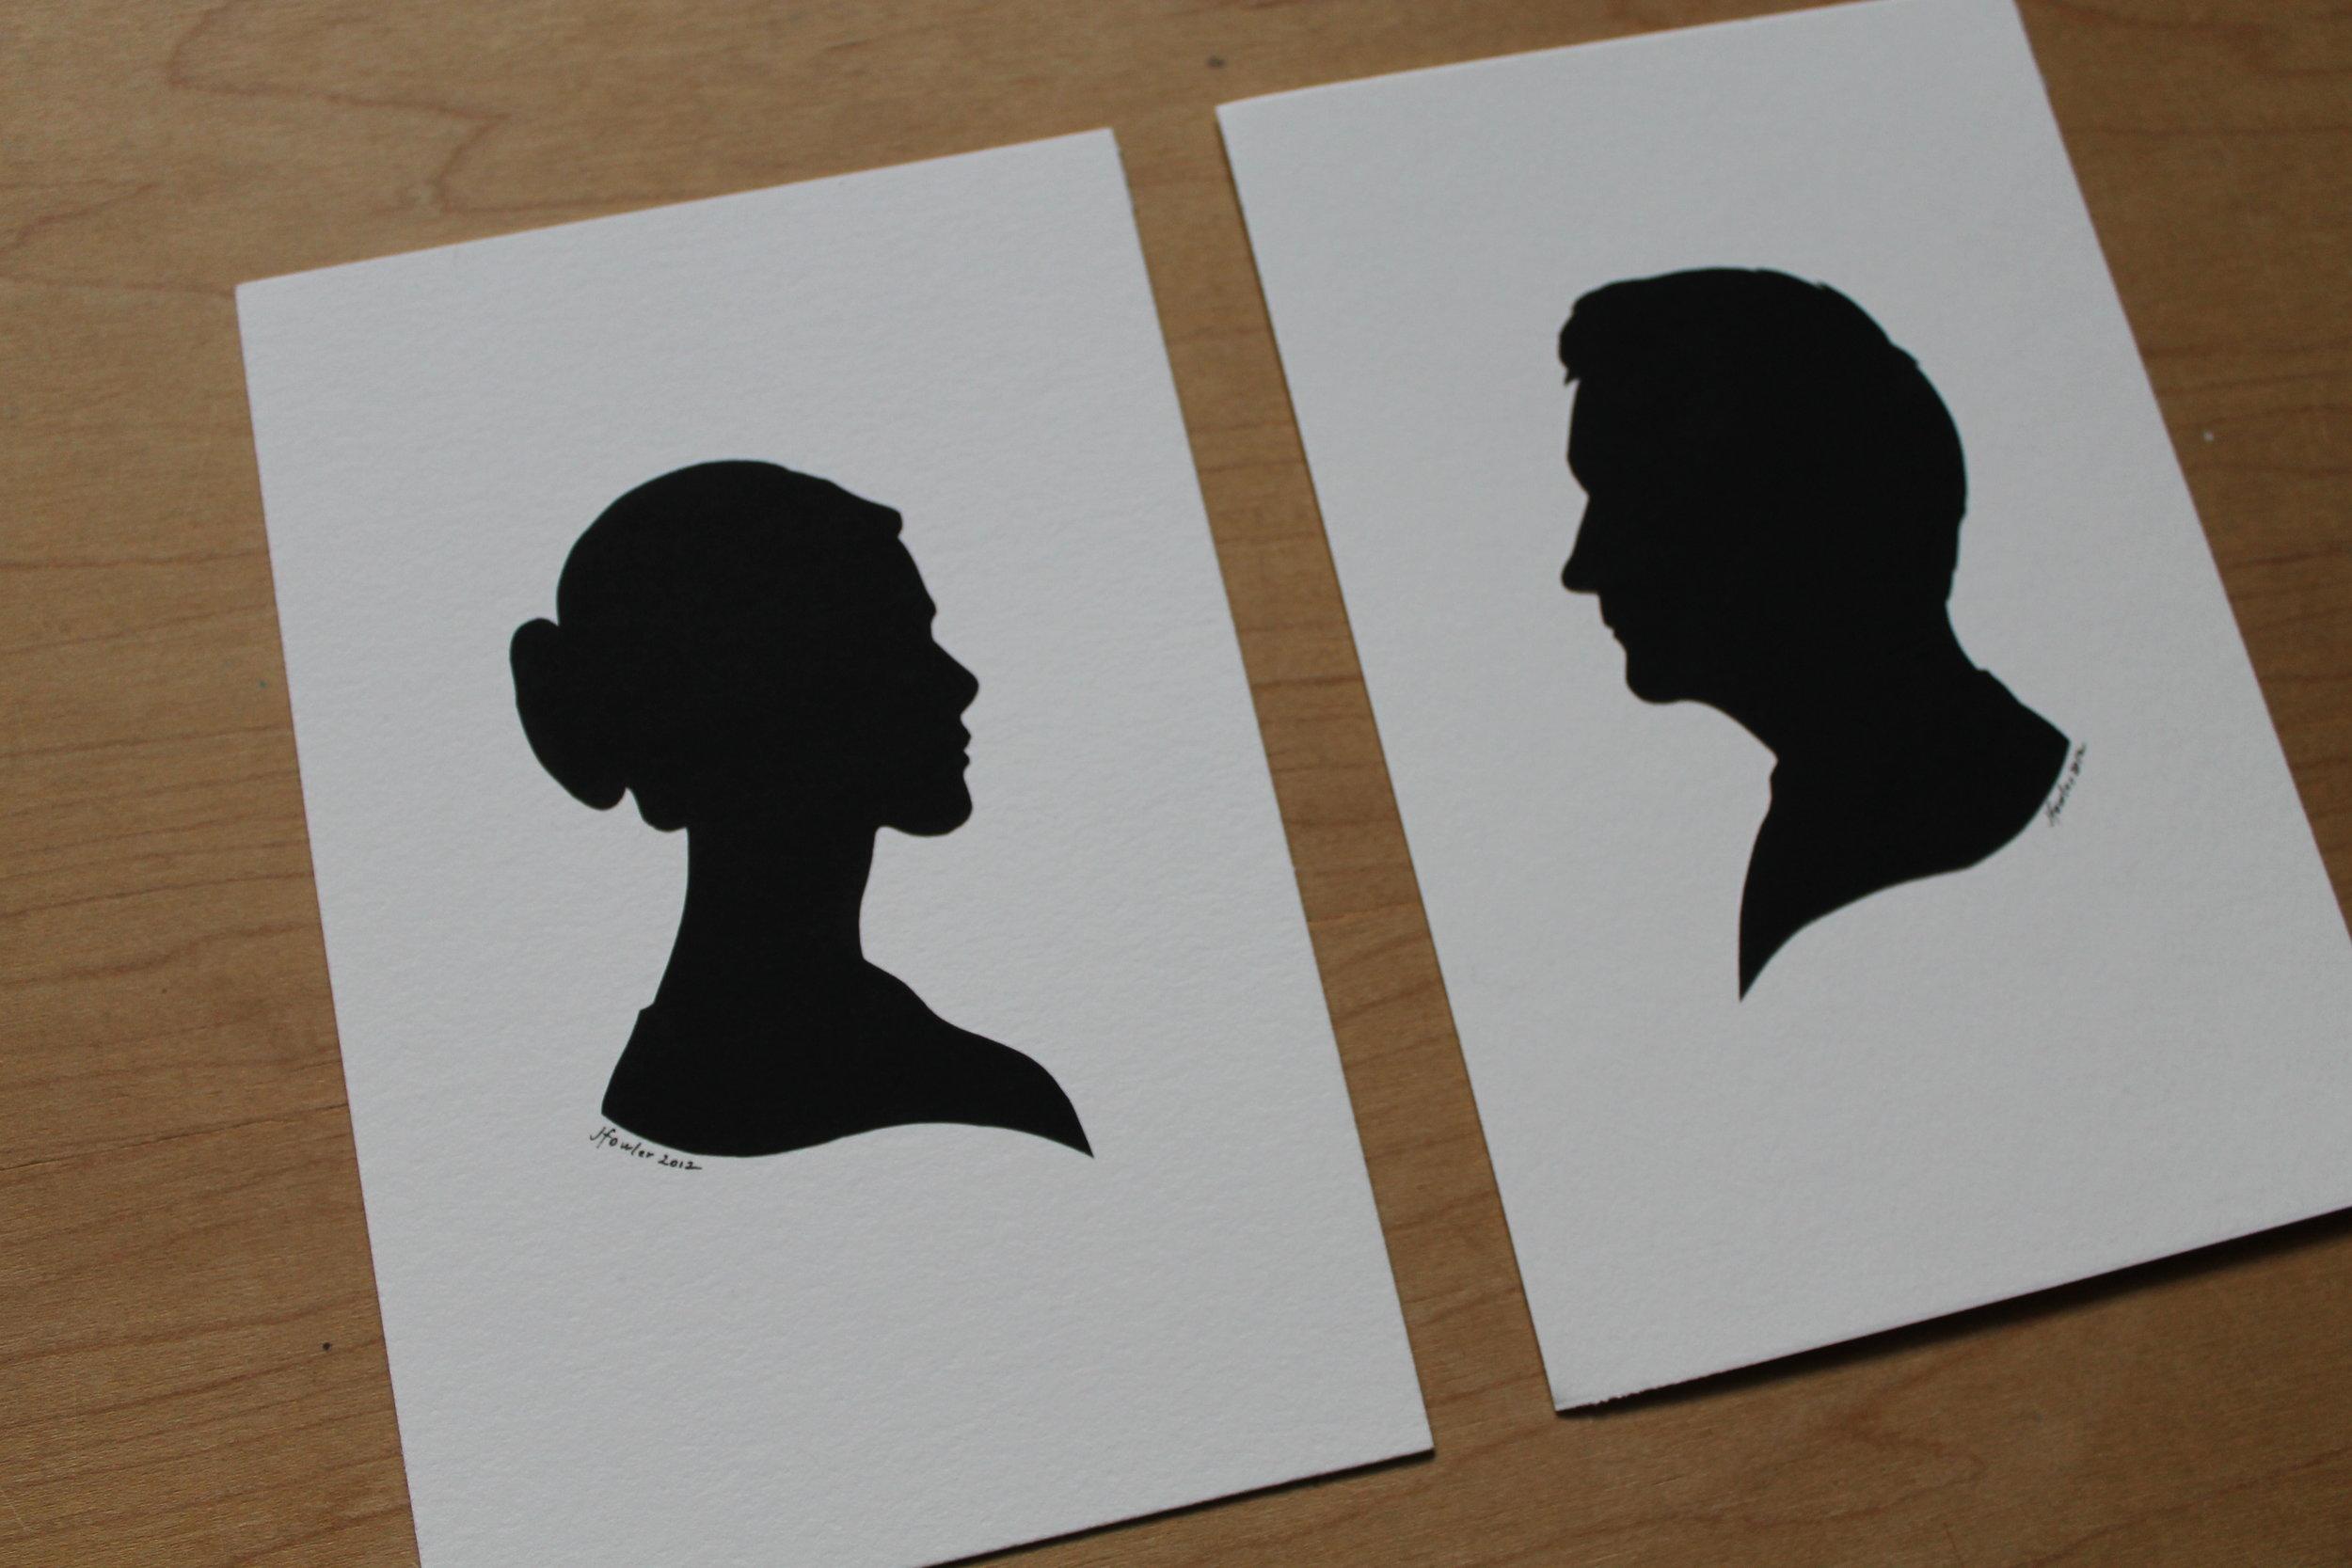 couple portrait 5x7s jlf.JPG